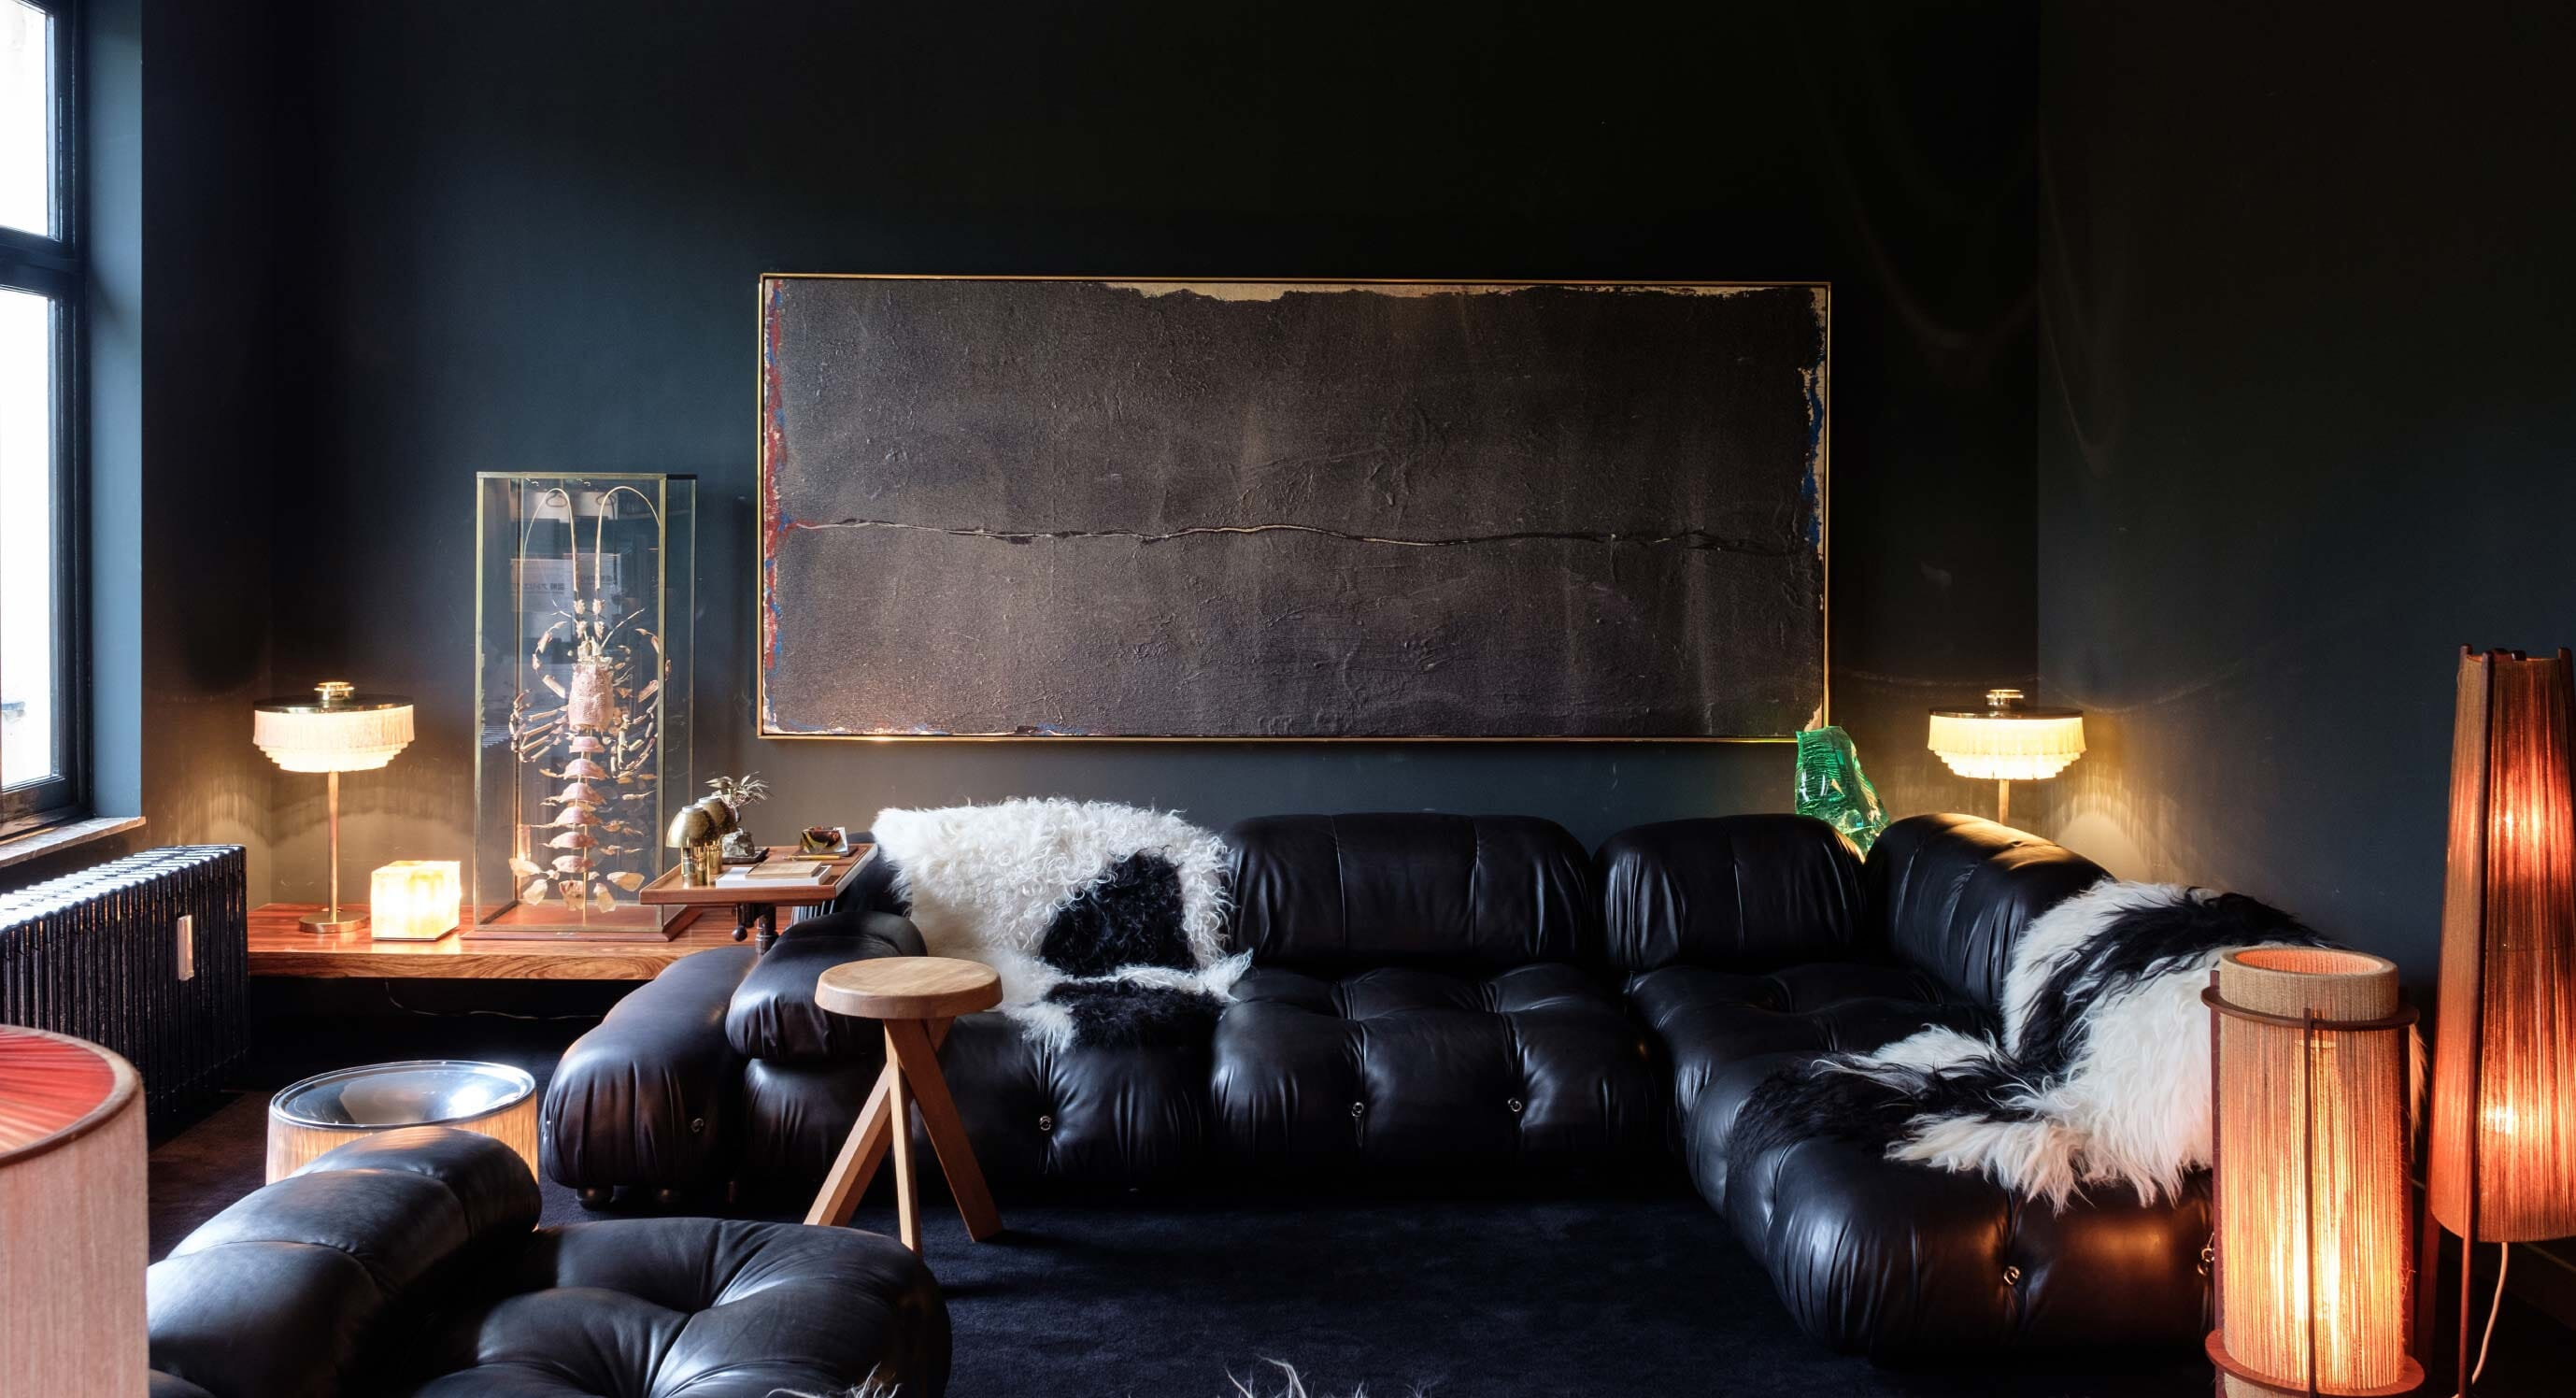 At home in Brussels: Bellerose Artistic Director Derek Van Heurck's apartment